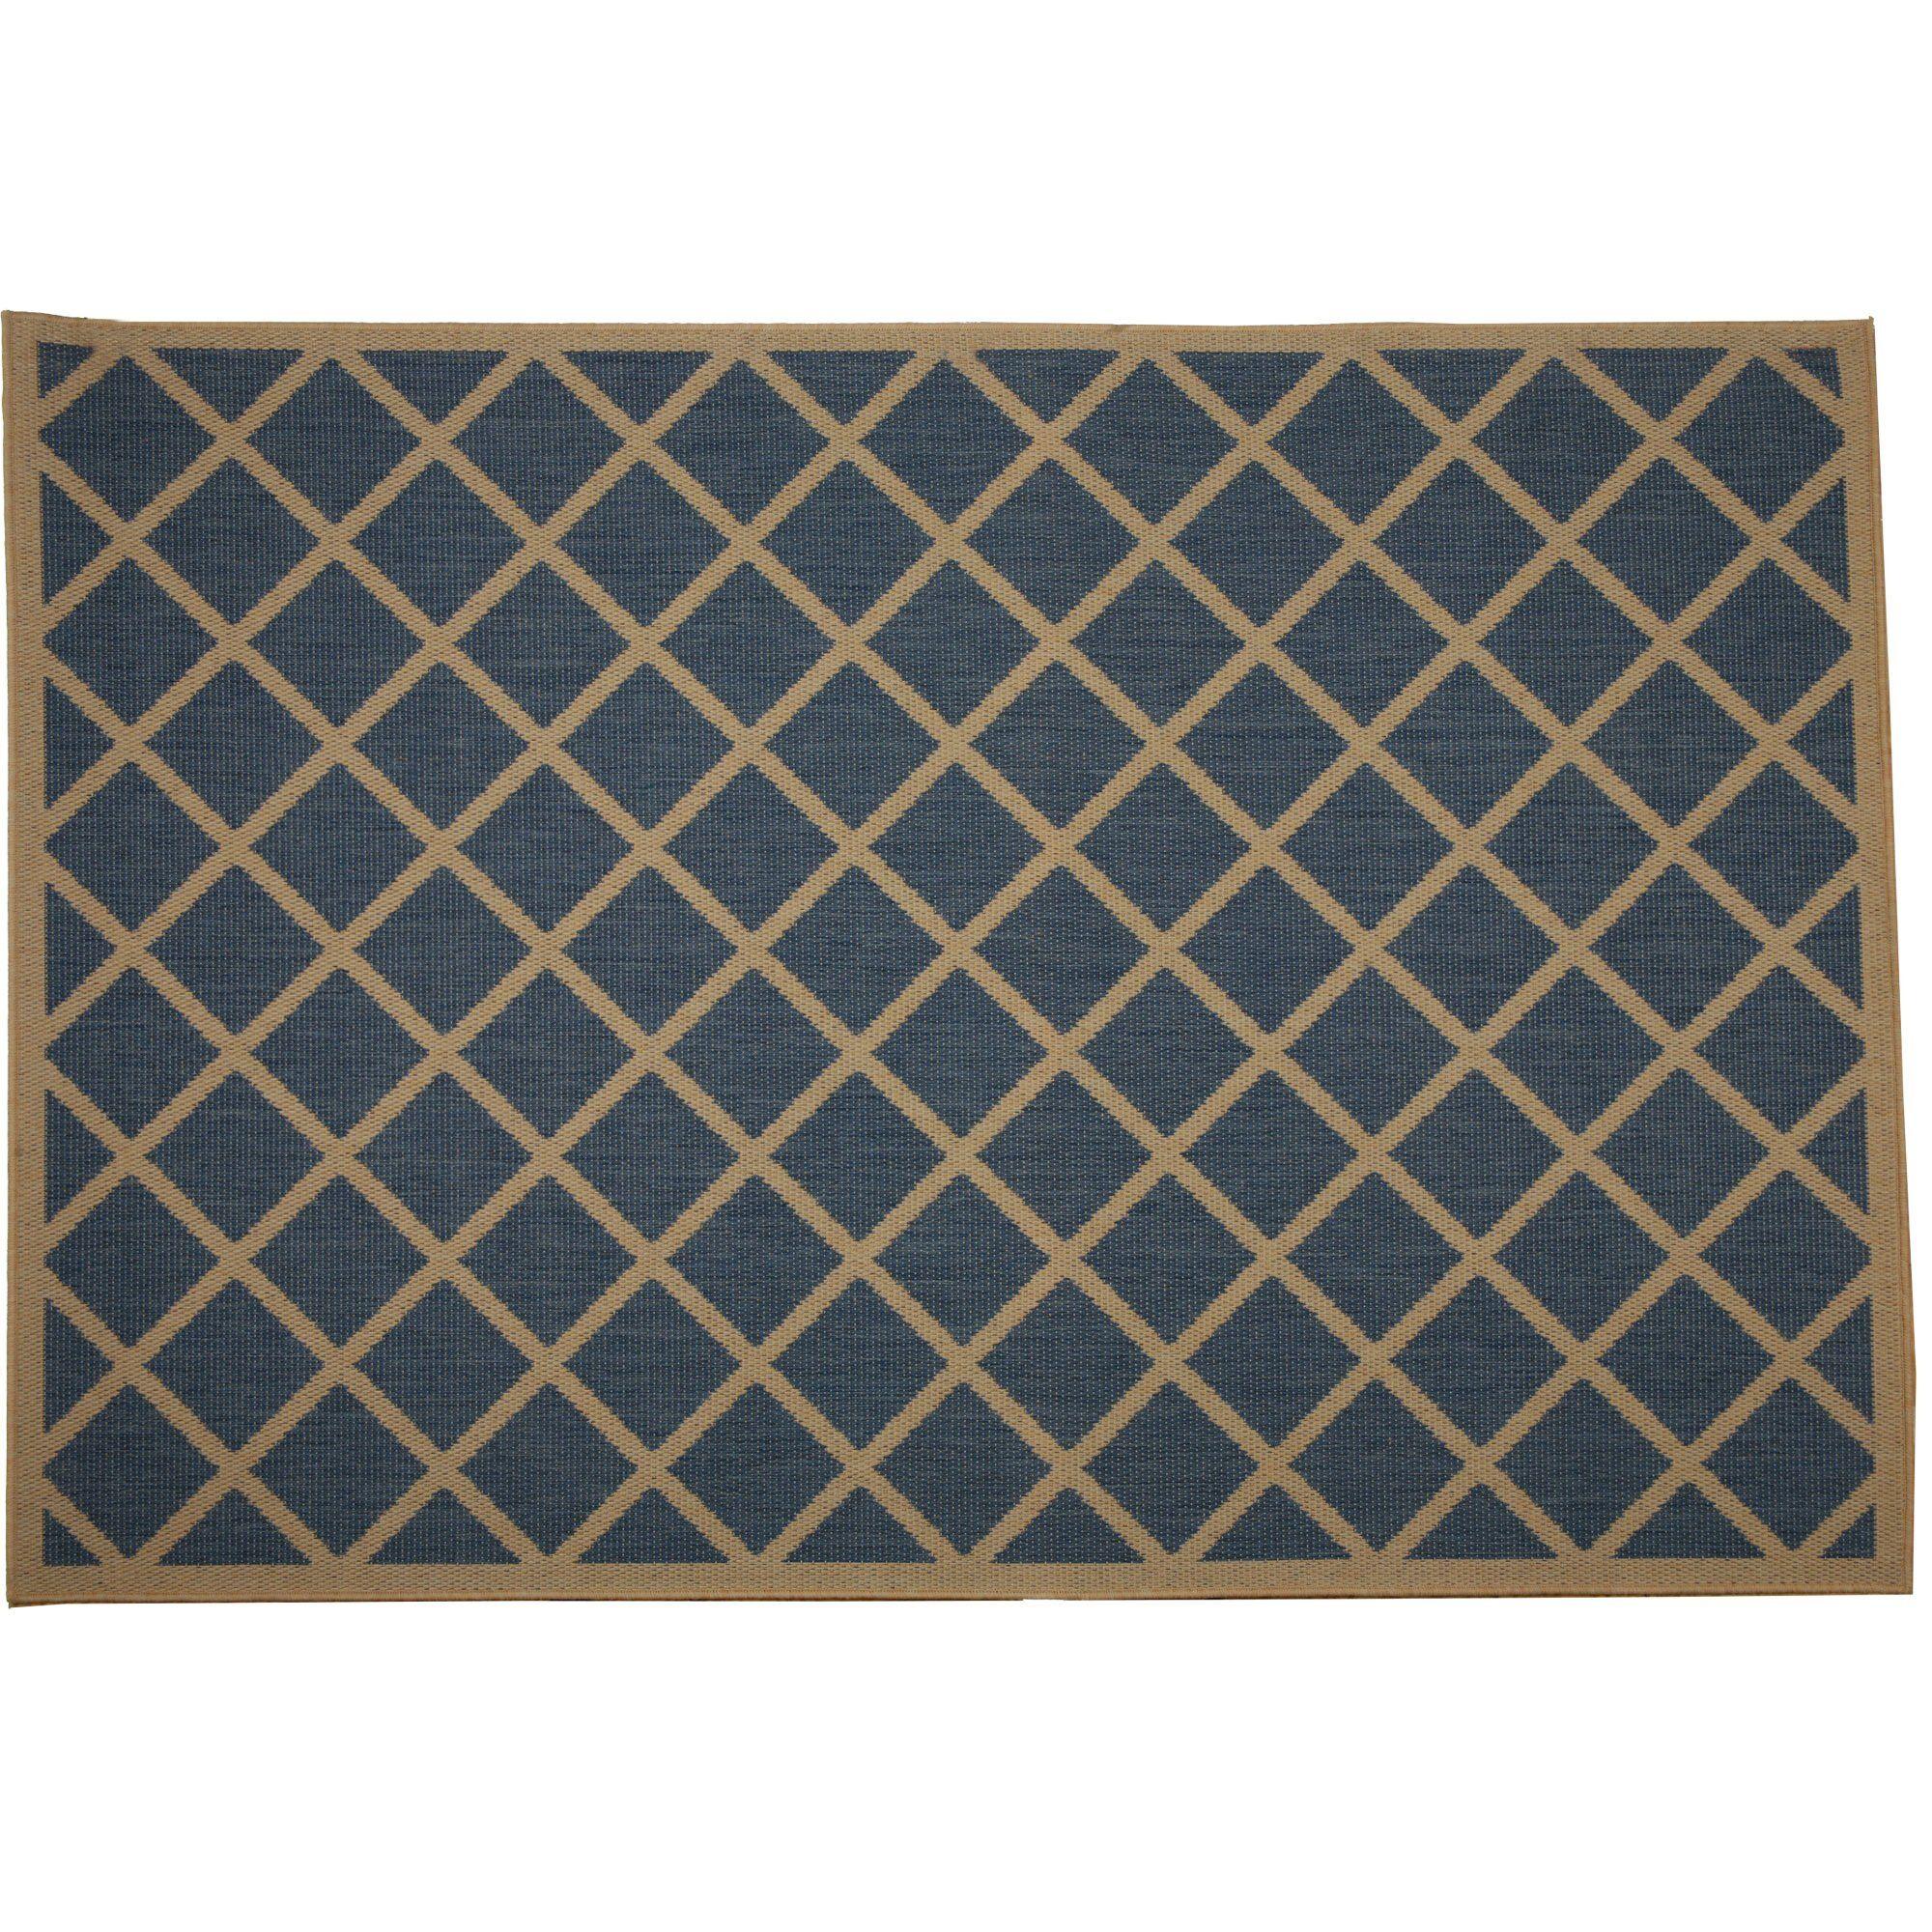 Eells Blue Geometric Indoor/Outdoor Area Rug Rug Size: Rectangle 5' x 7'